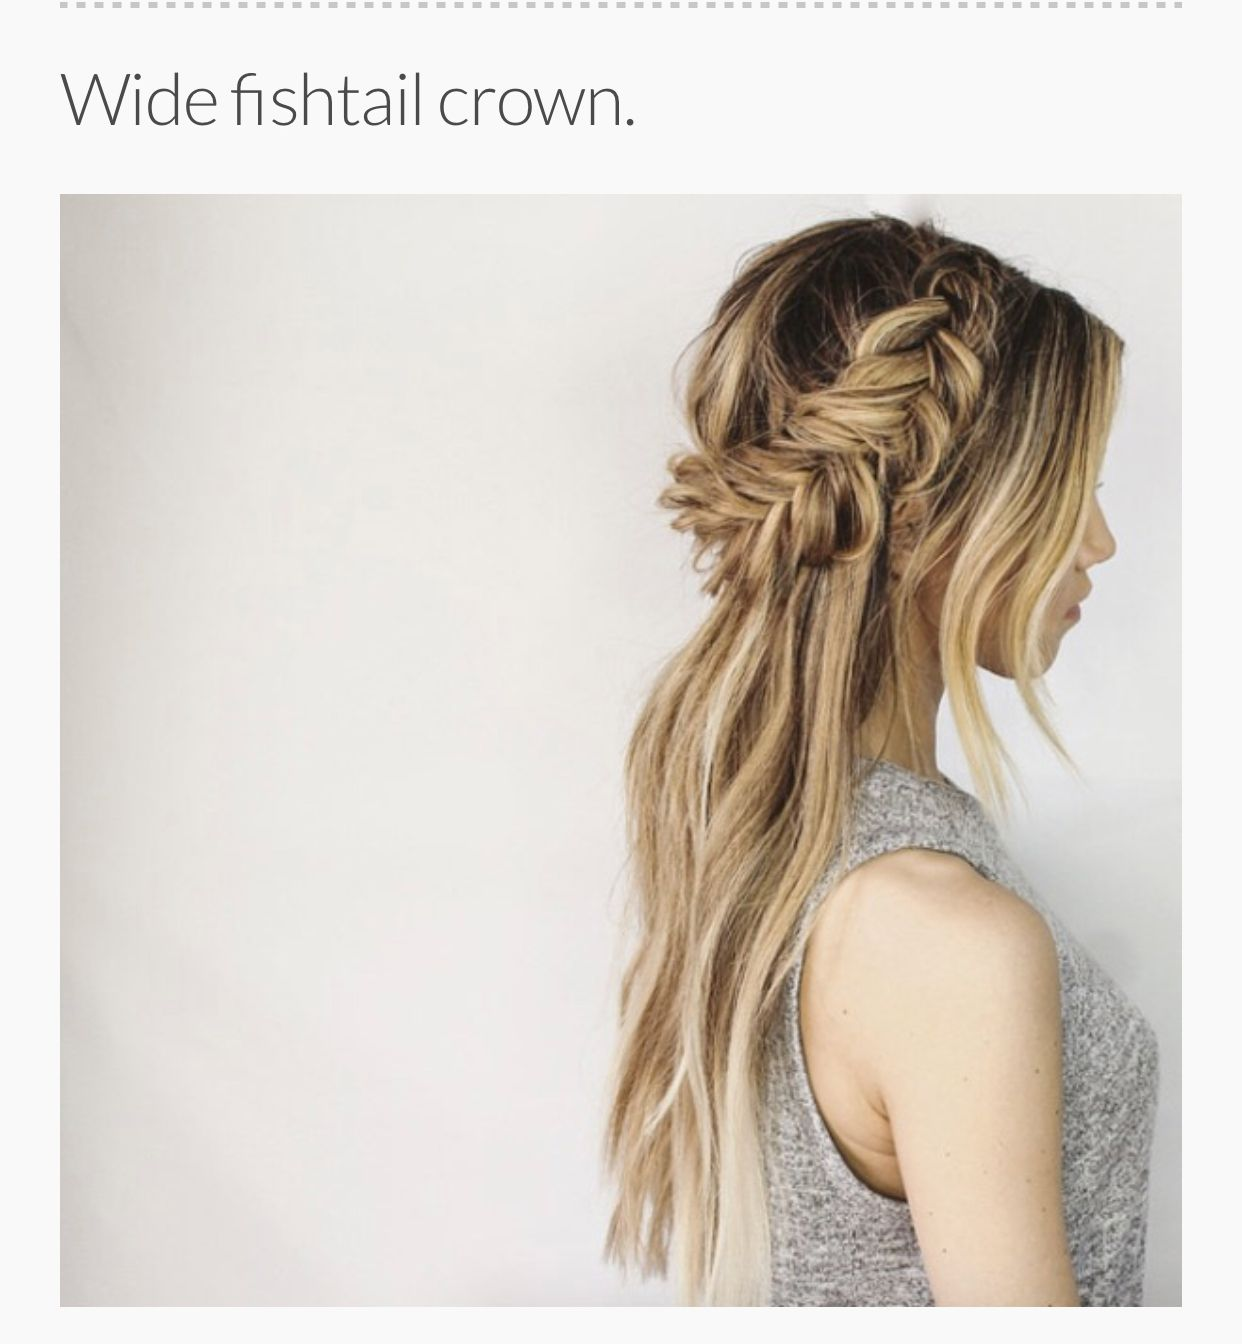 Pin by Tiffany Walker on Hair | Pinterest